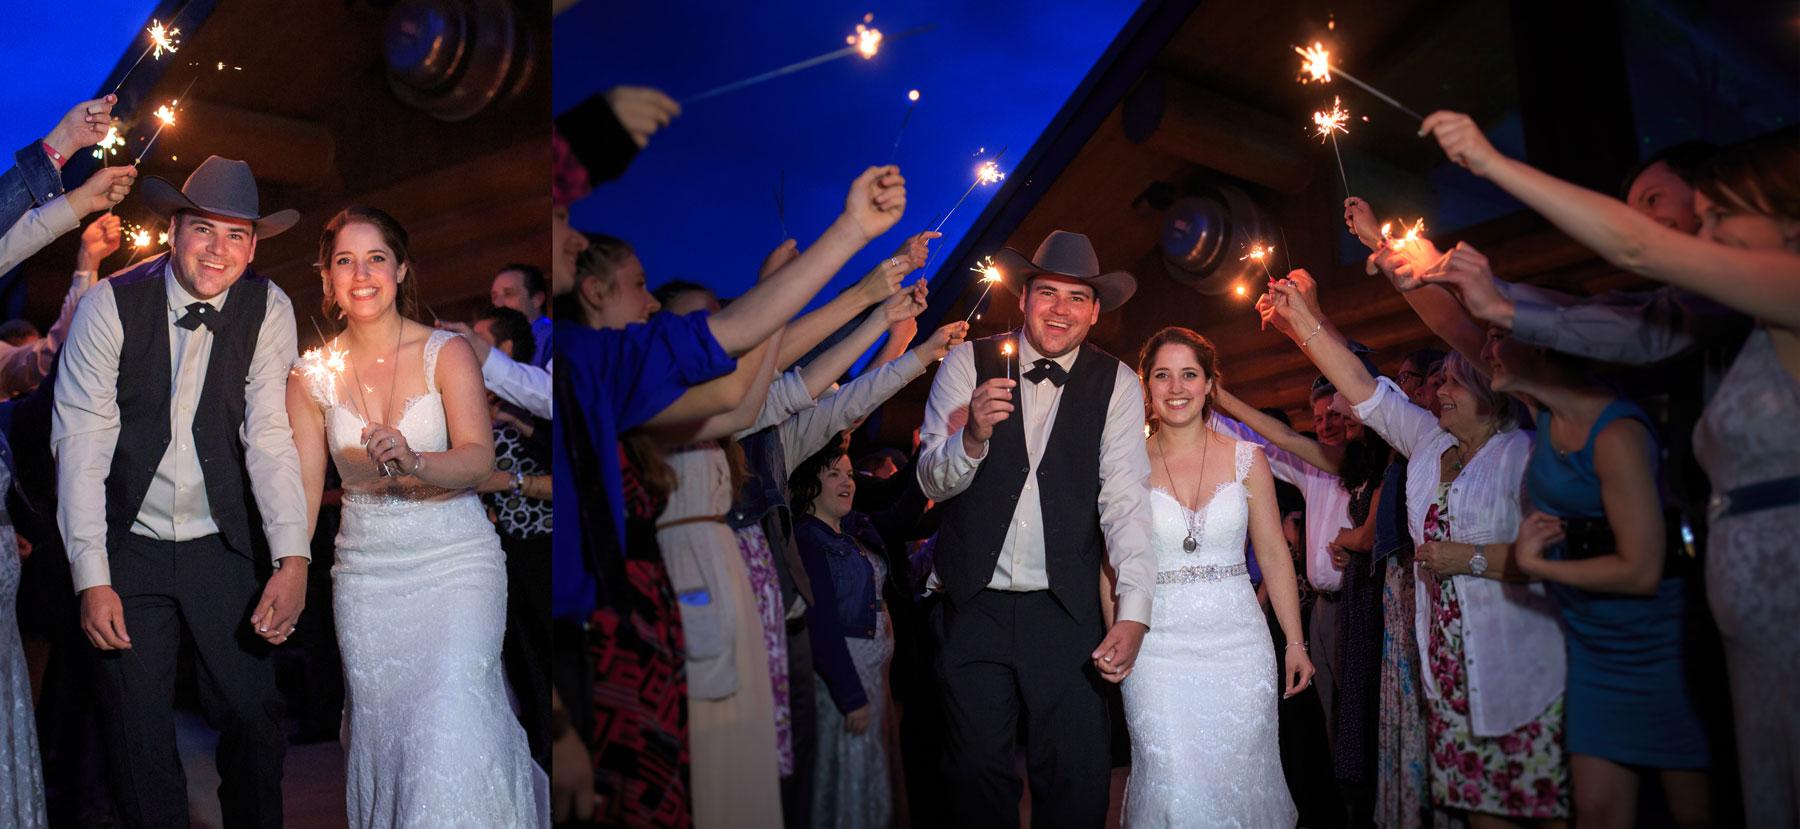 Angela & Patrick - Lacombe, Alberta Wedding Photography - Olson Studios (30)